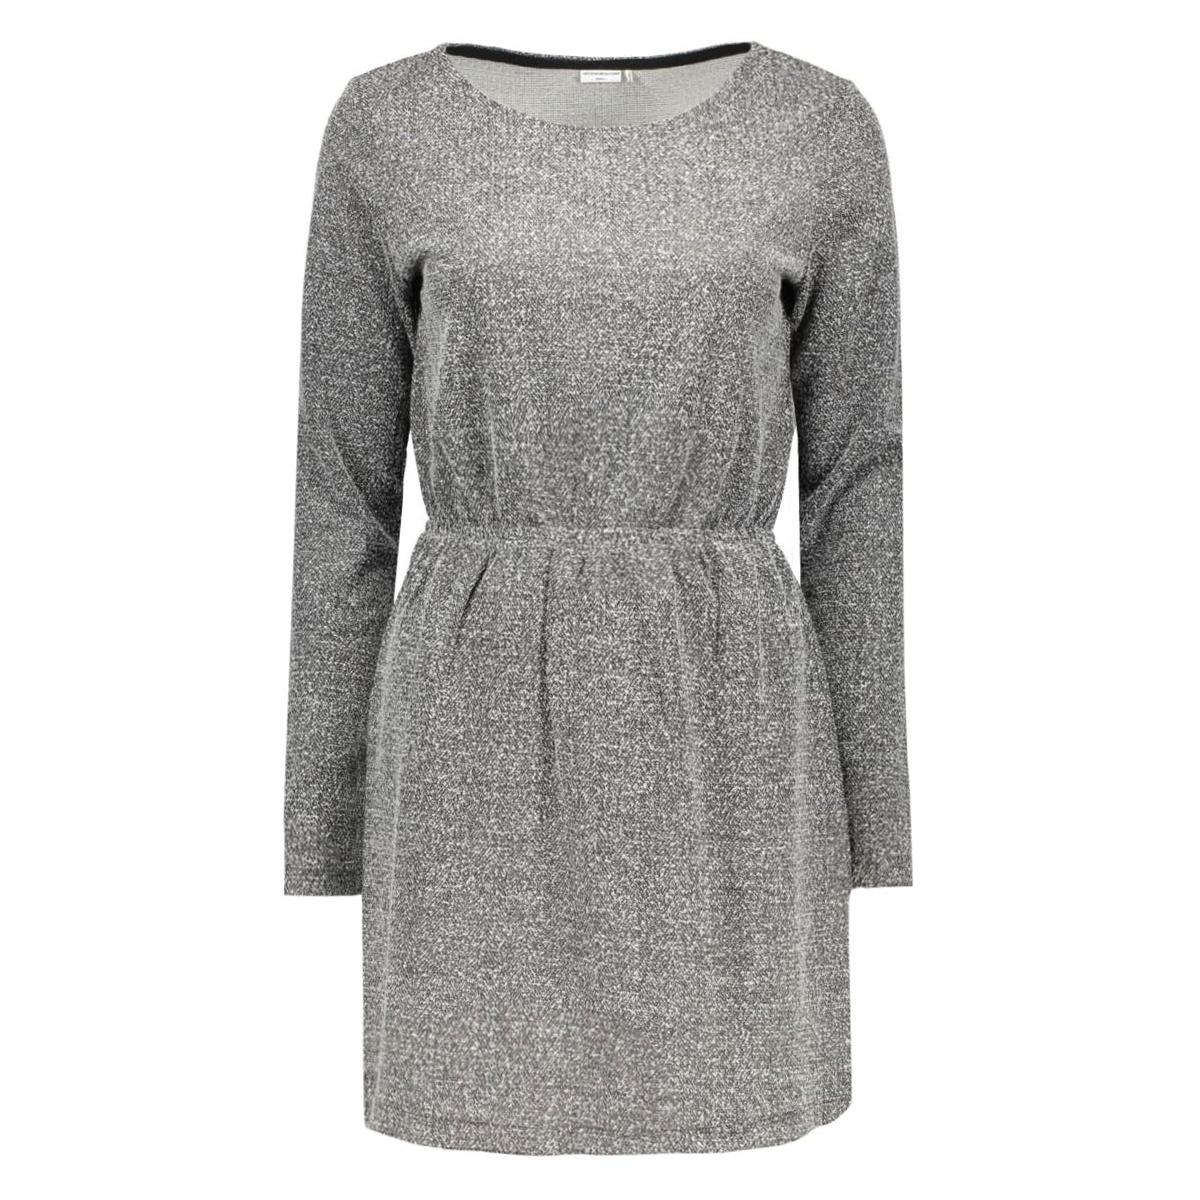 jdyteller l/s dress swt 15117189 jacqueline de yong jurk dark grey melange